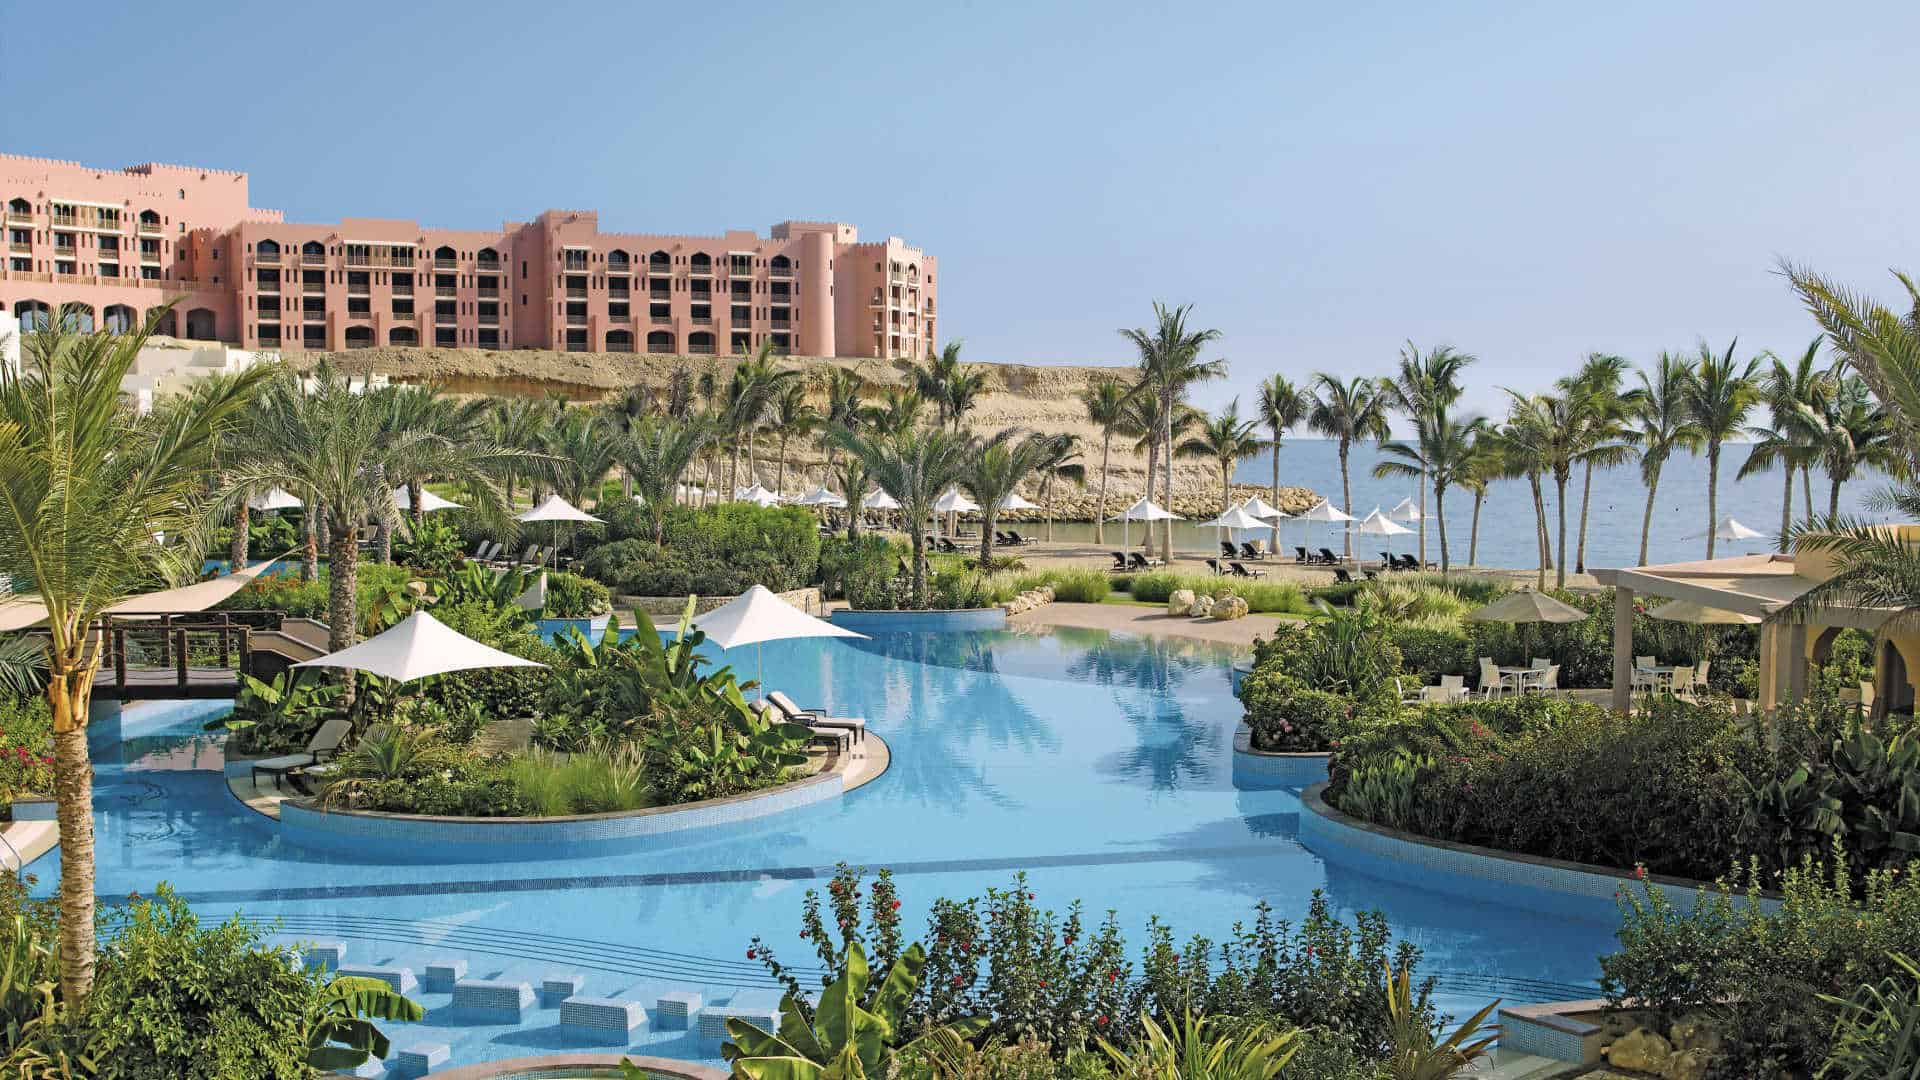 Shangri La's Barr Al Jissah Resort and Spa